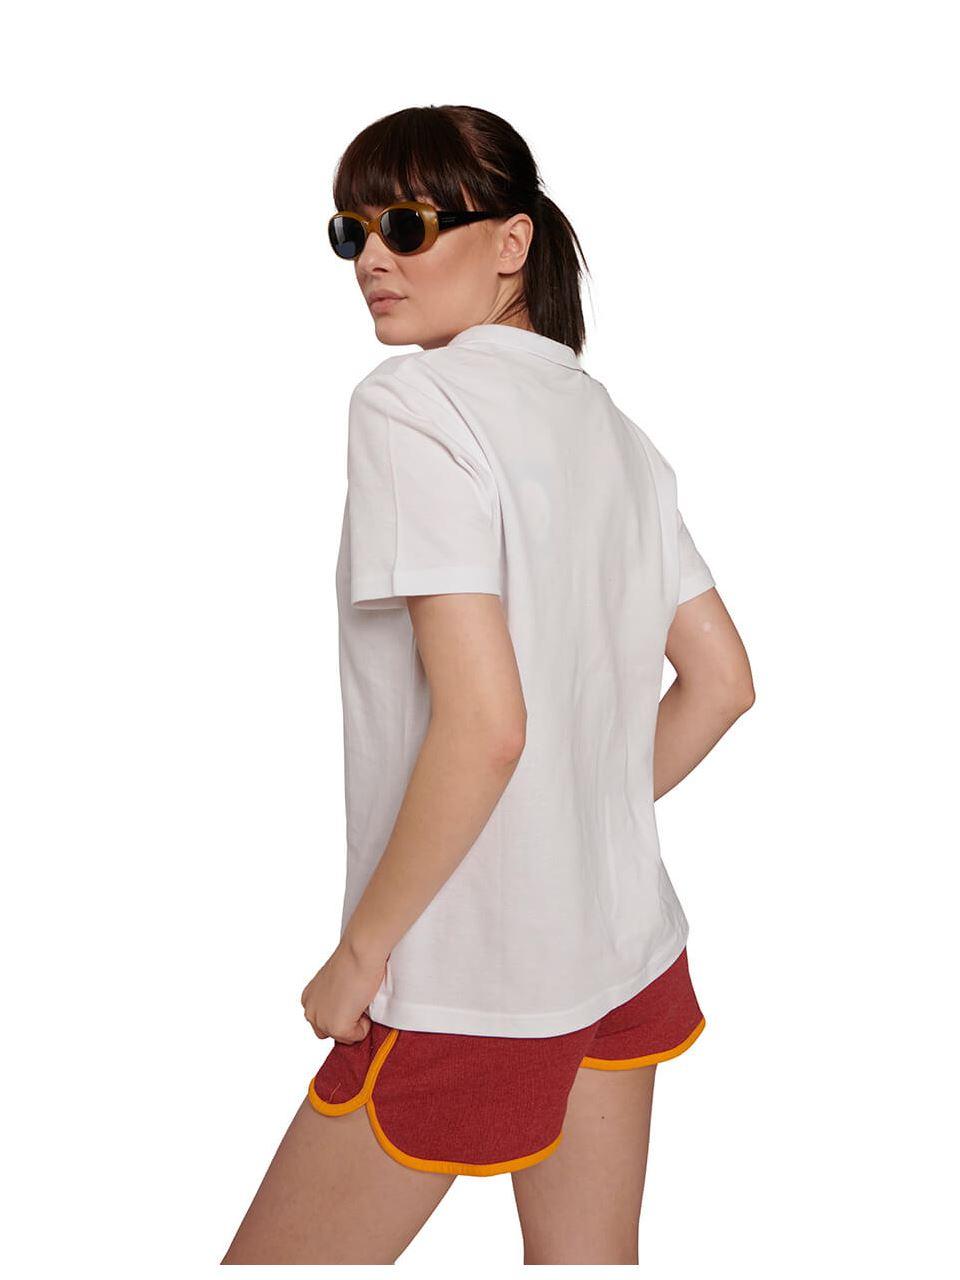 K88062 Polo T-shirt